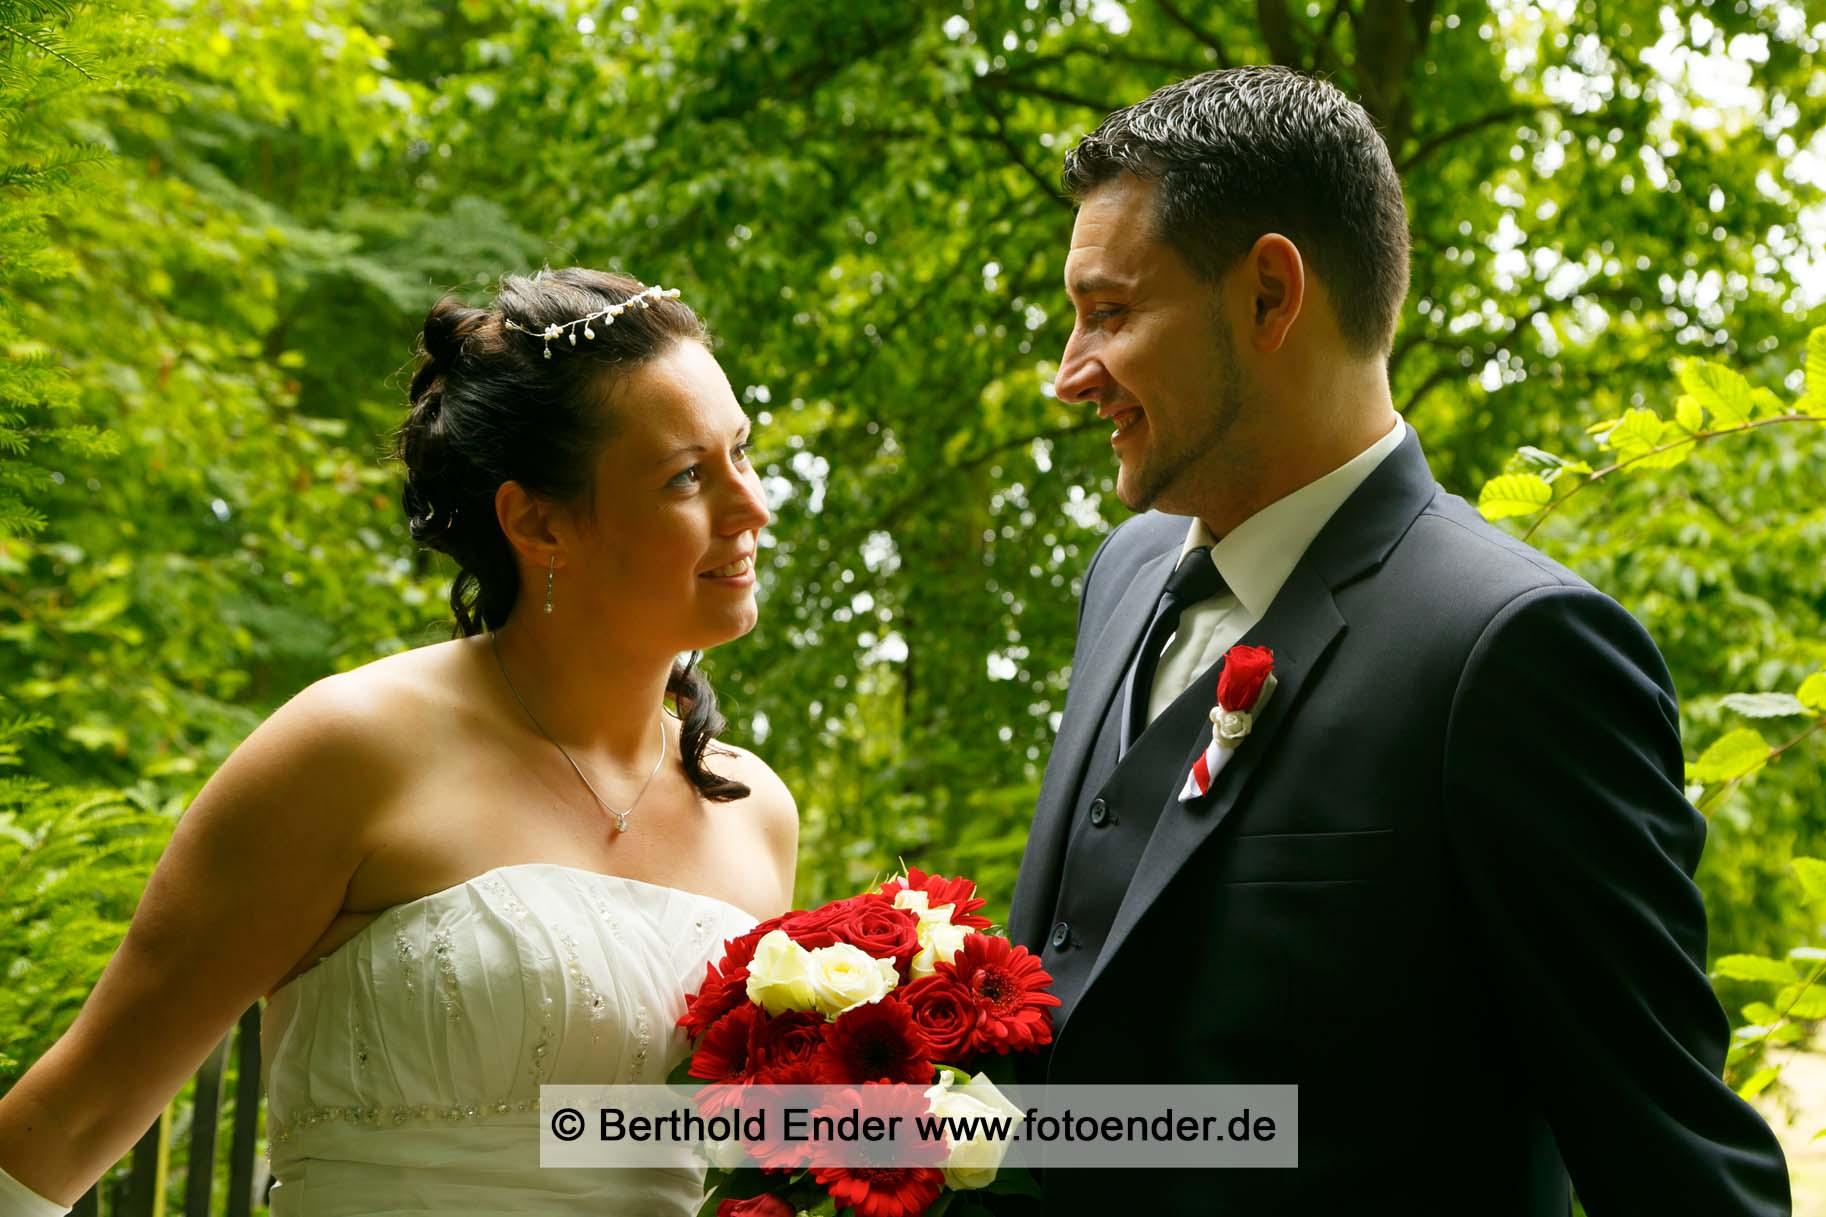 Brautpaarfotos im Wörlitzer Park, Fotostudio Ender